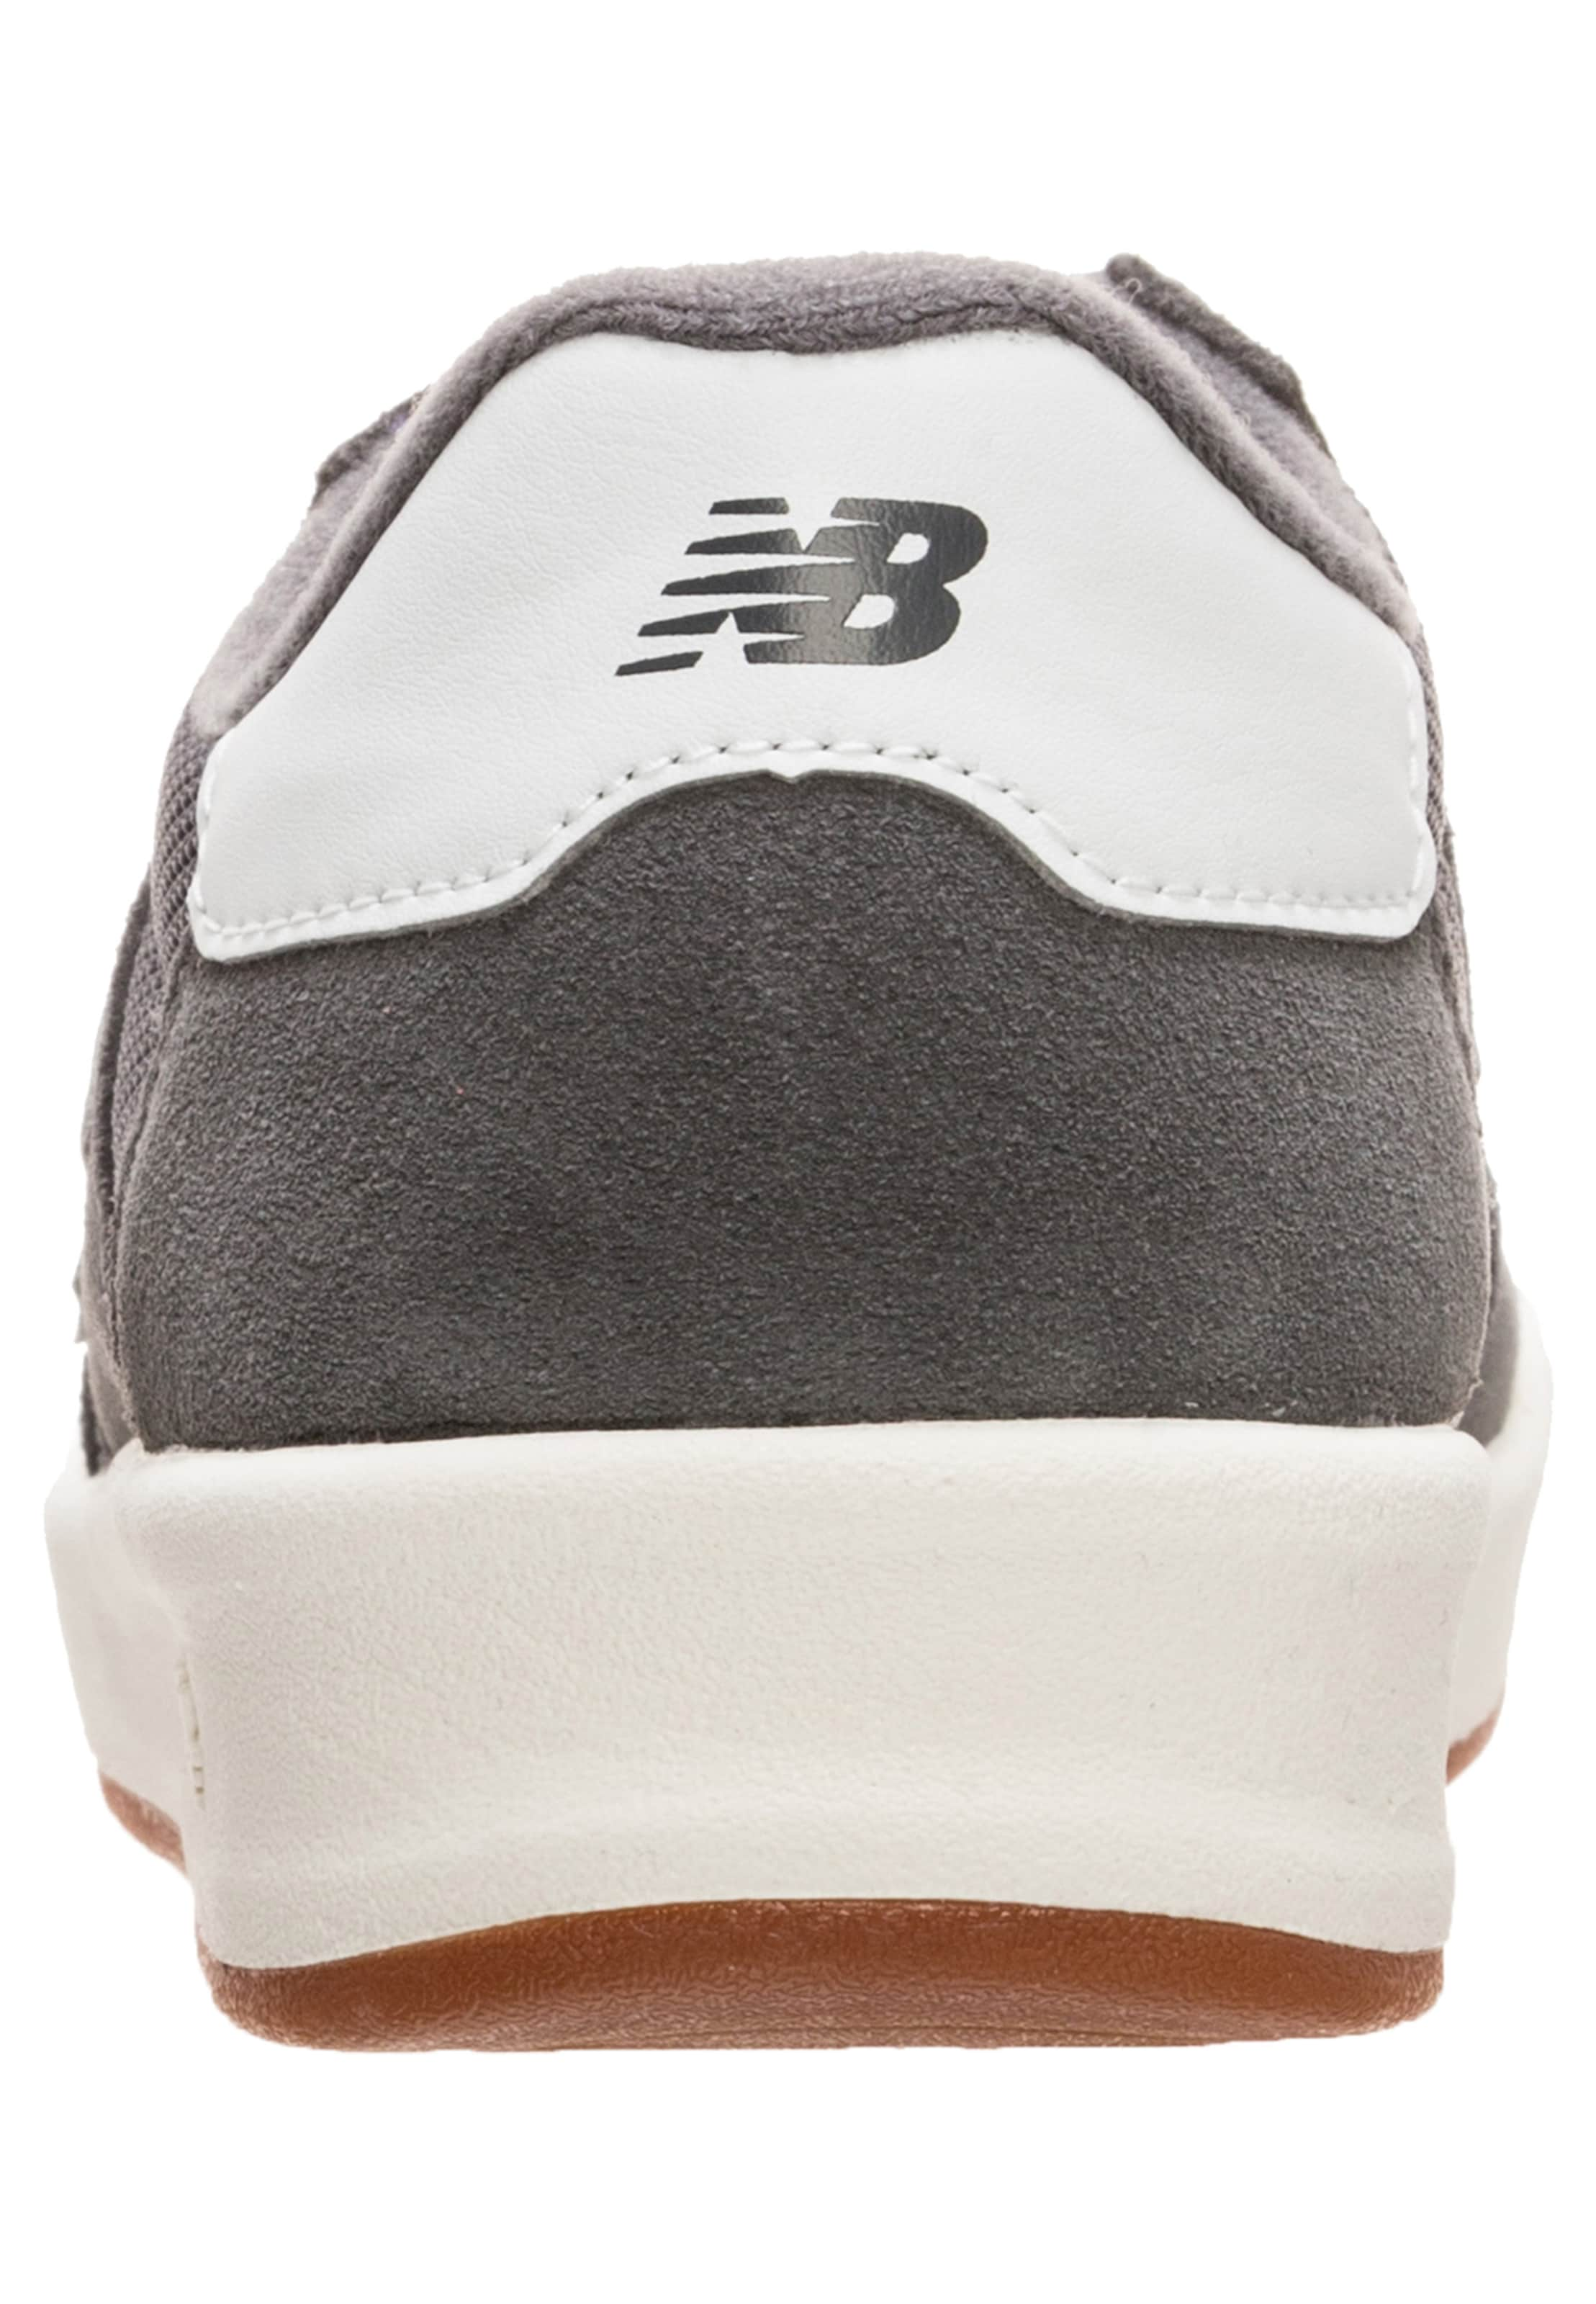 b' Basses GrisBlanc En New fg Balance Baskets 'wrt300 n80PkwOX